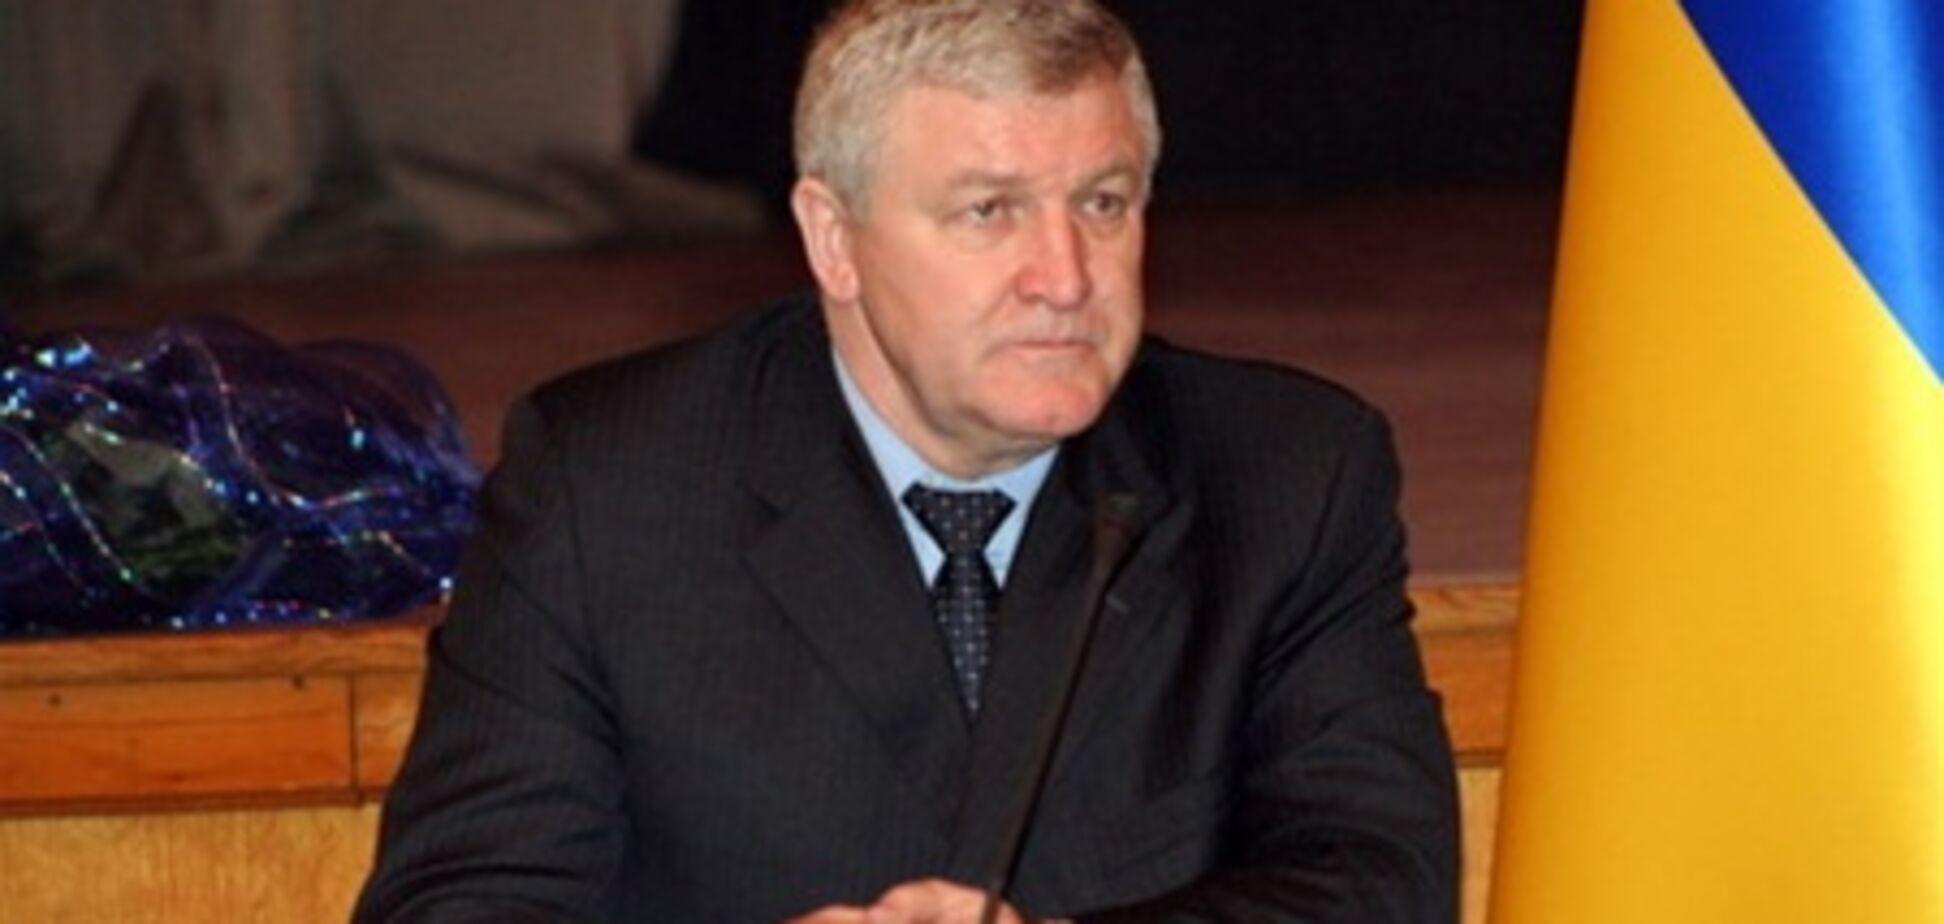 Ежель стал советником Януковича